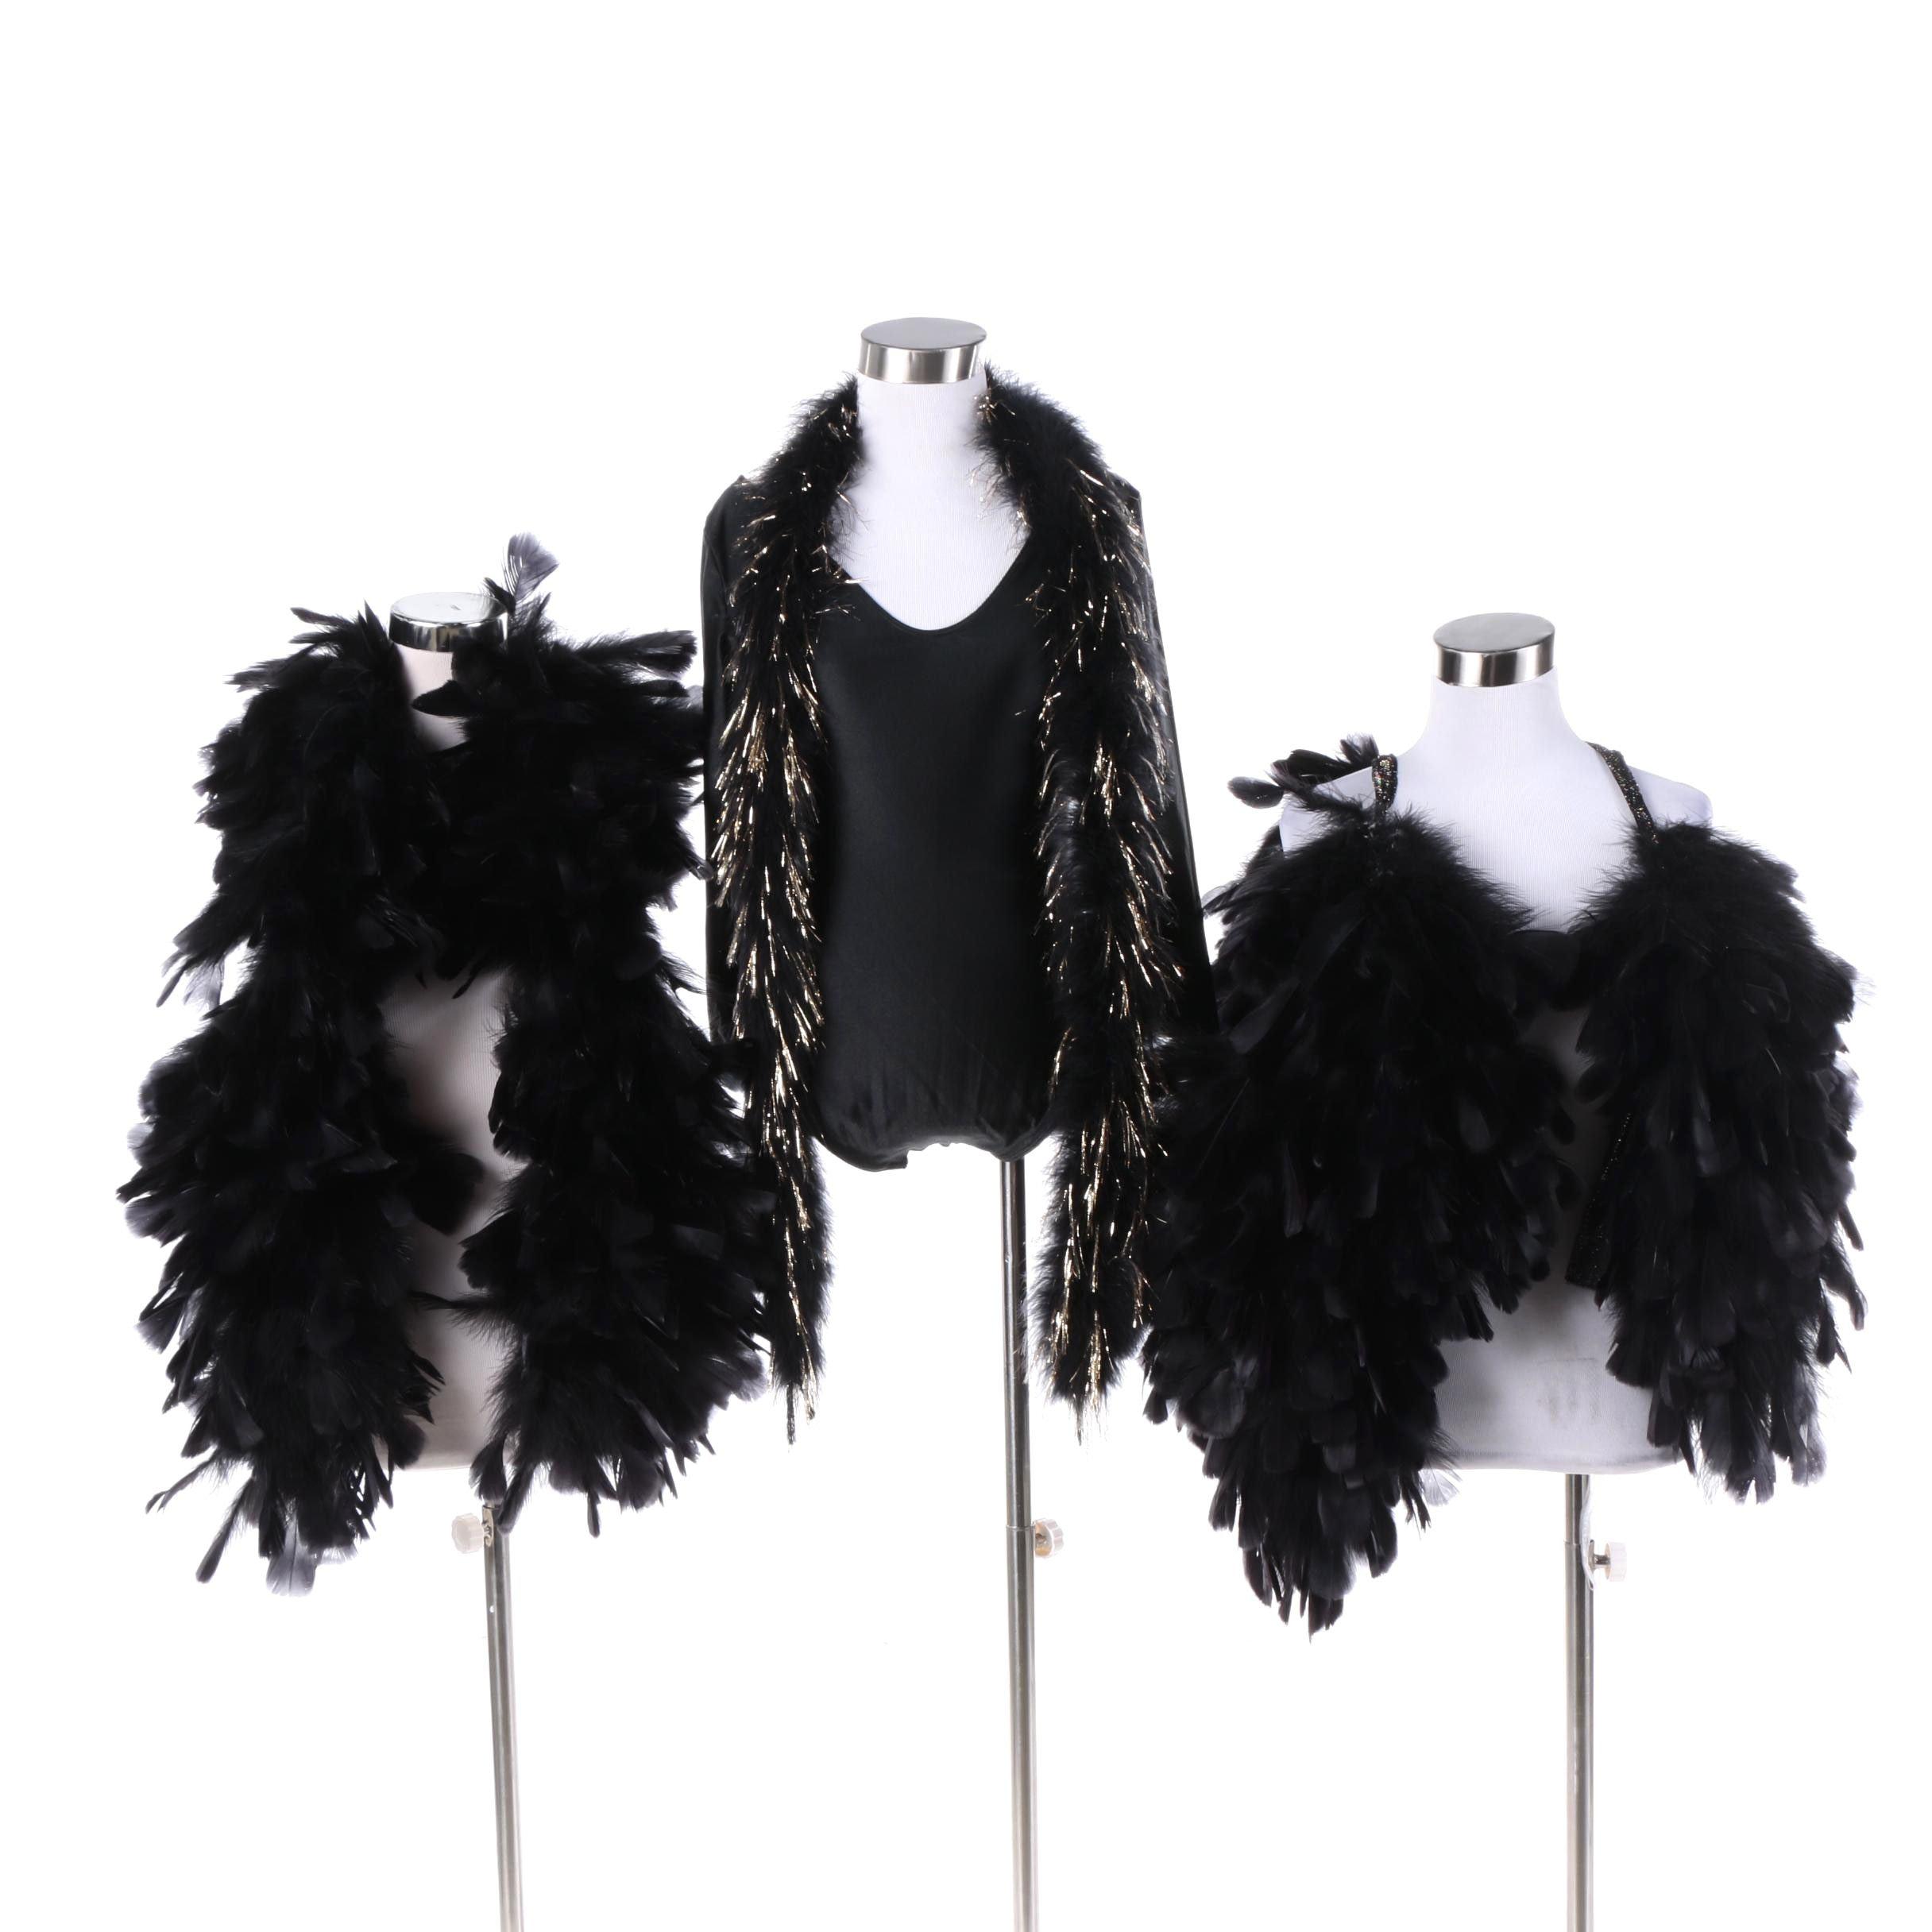 Danskin Black Poly-Blend Leotard and Feathered Boas